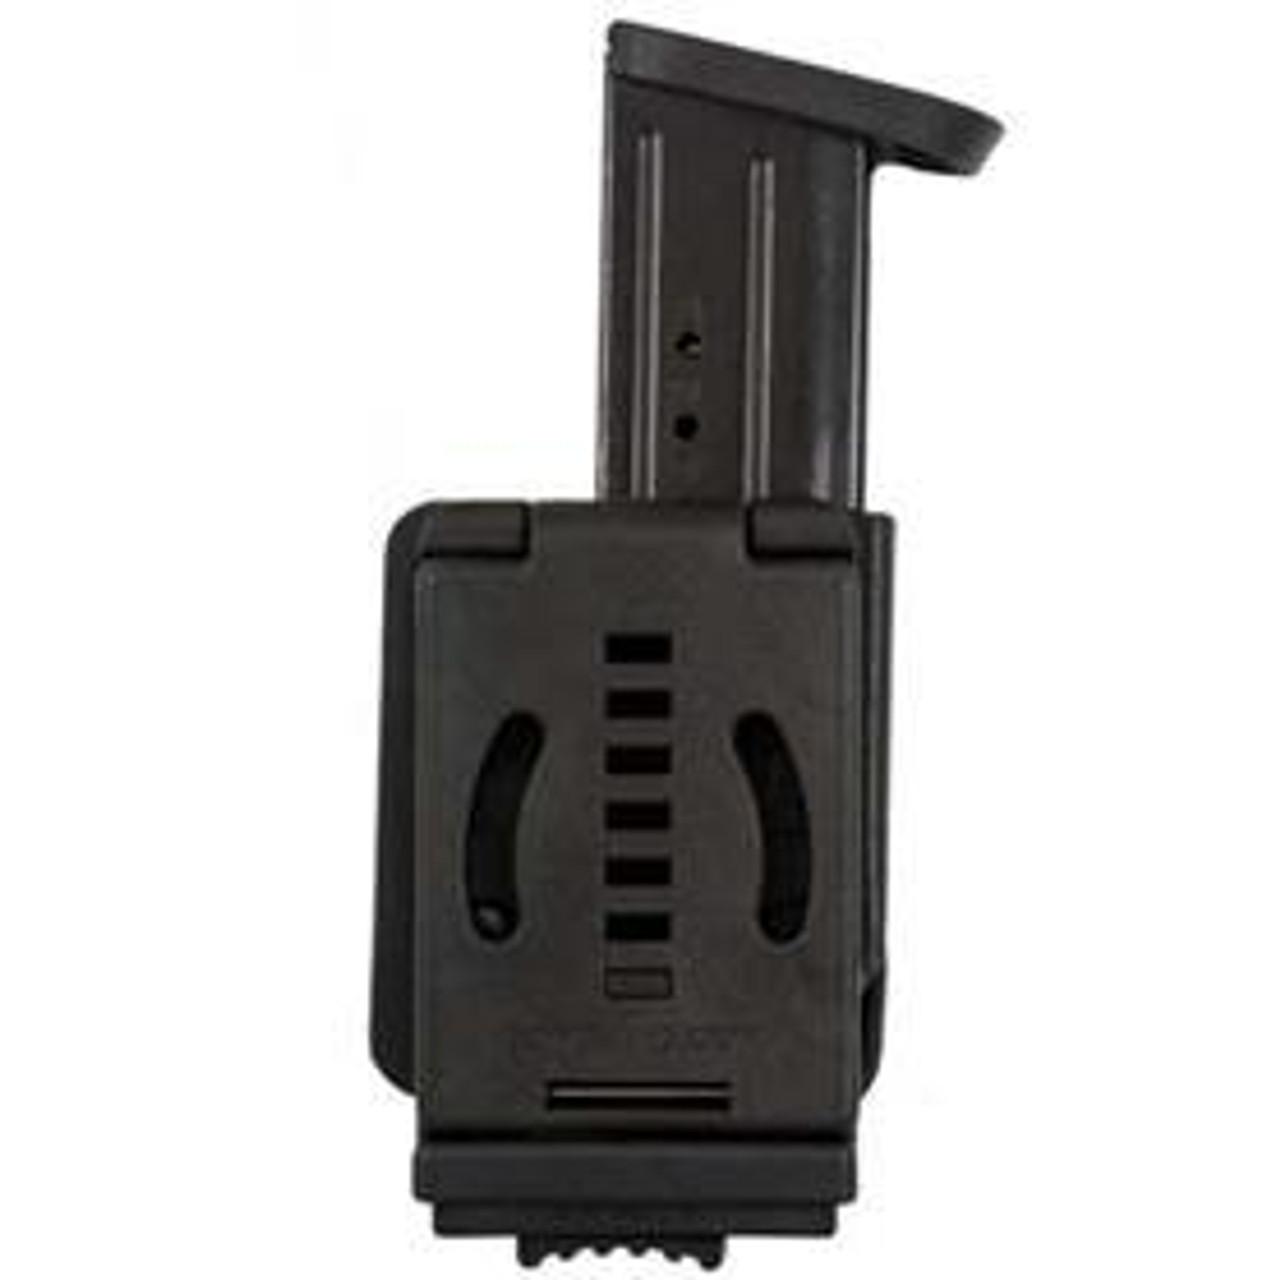 Single Magazine Pouch PLM | IDPA & USPSA approved | Comp-Tac